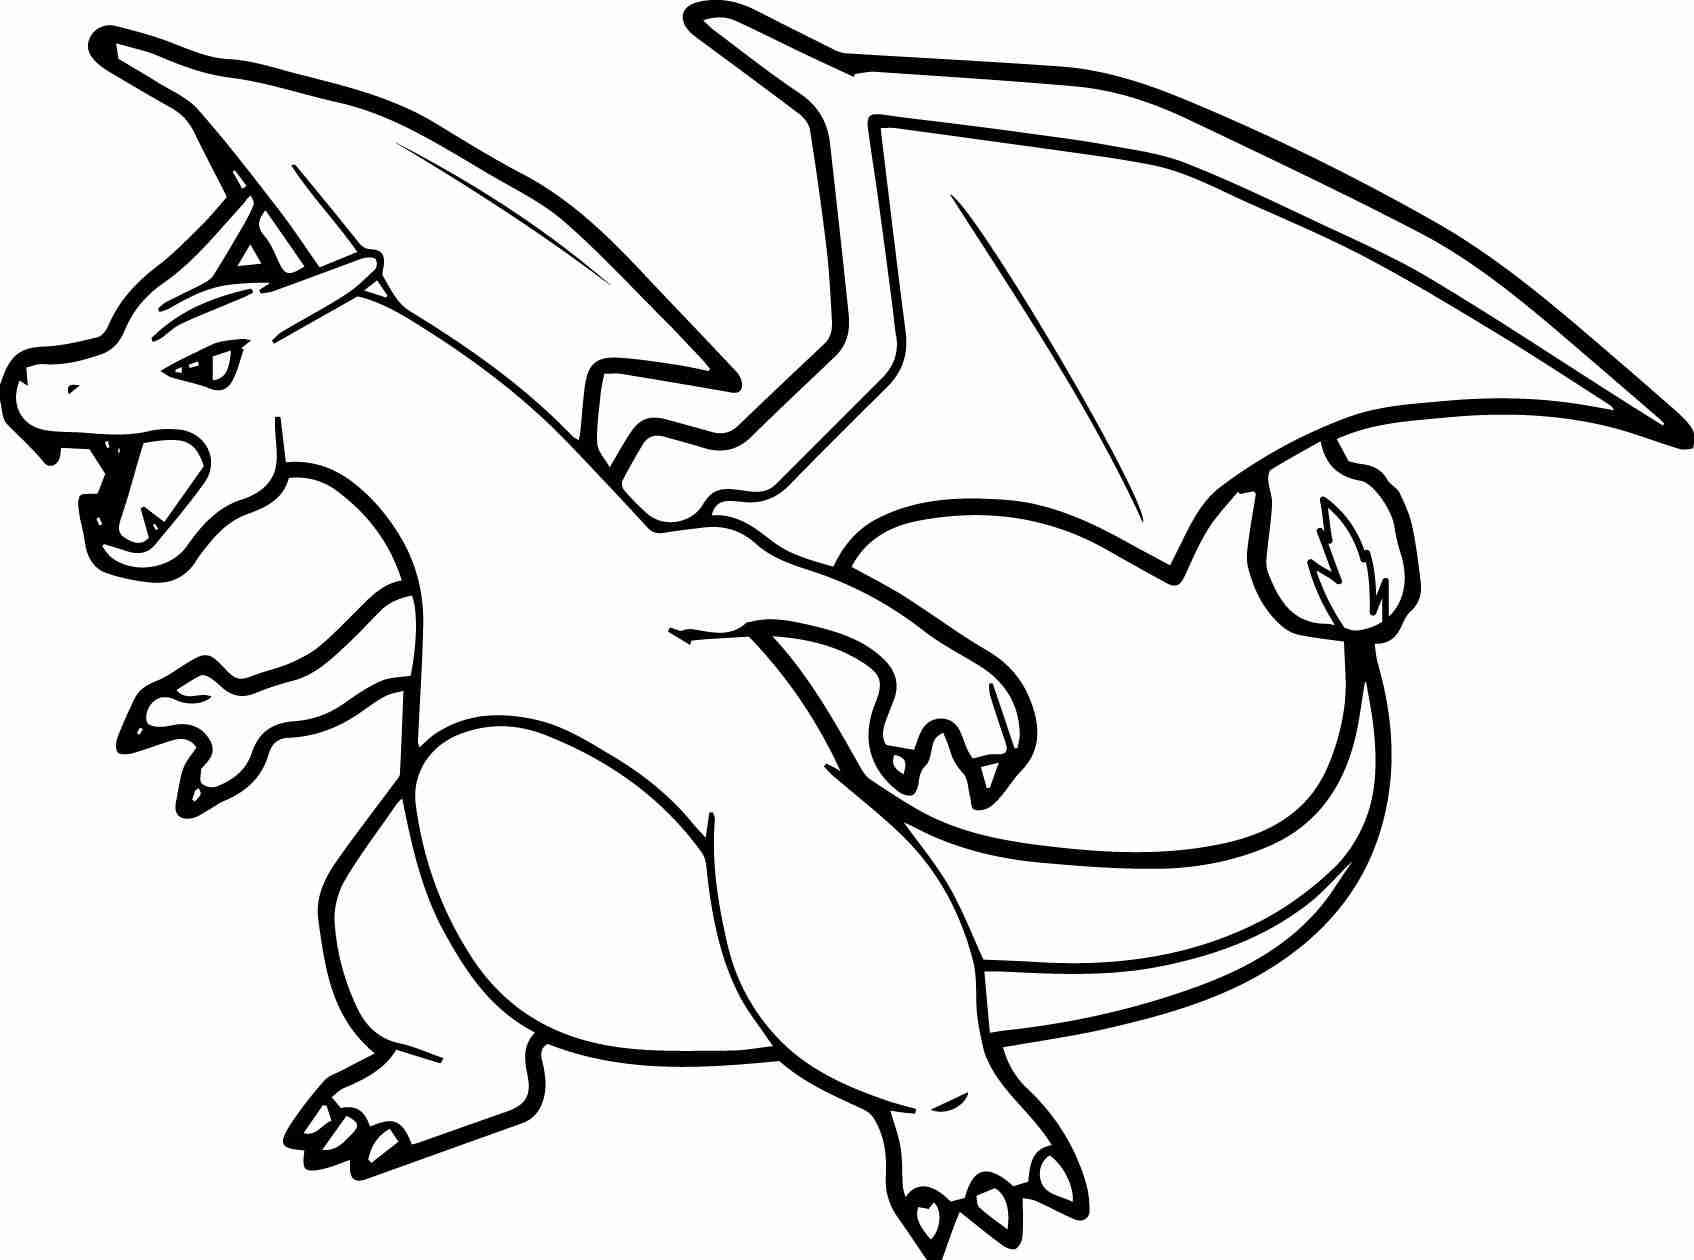 1694x1260 Coloring Pages Decorative Pokemon Mega Charizard Striking Olegratiy